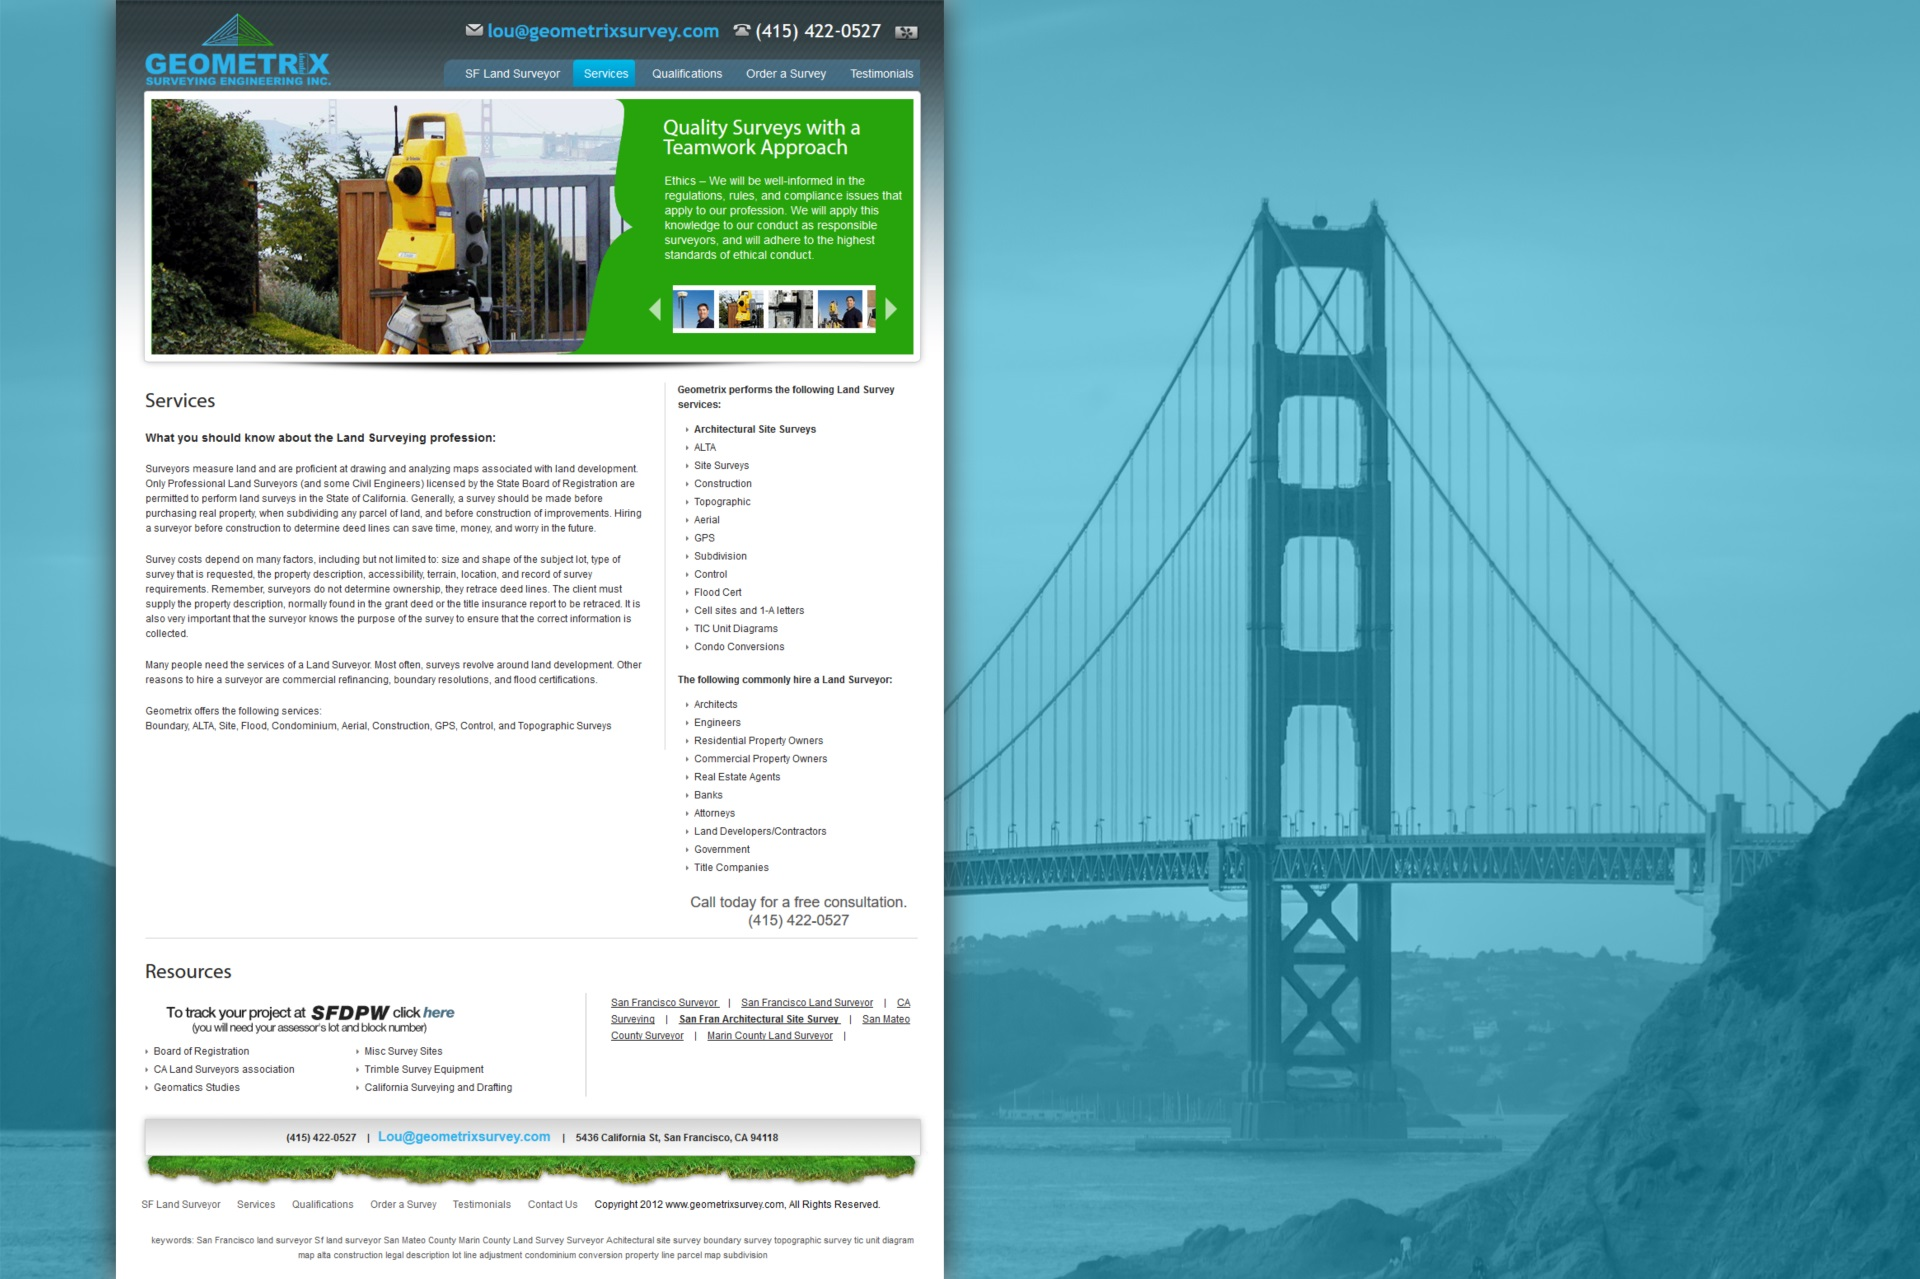 Geometrix Surveying Engineering Services.